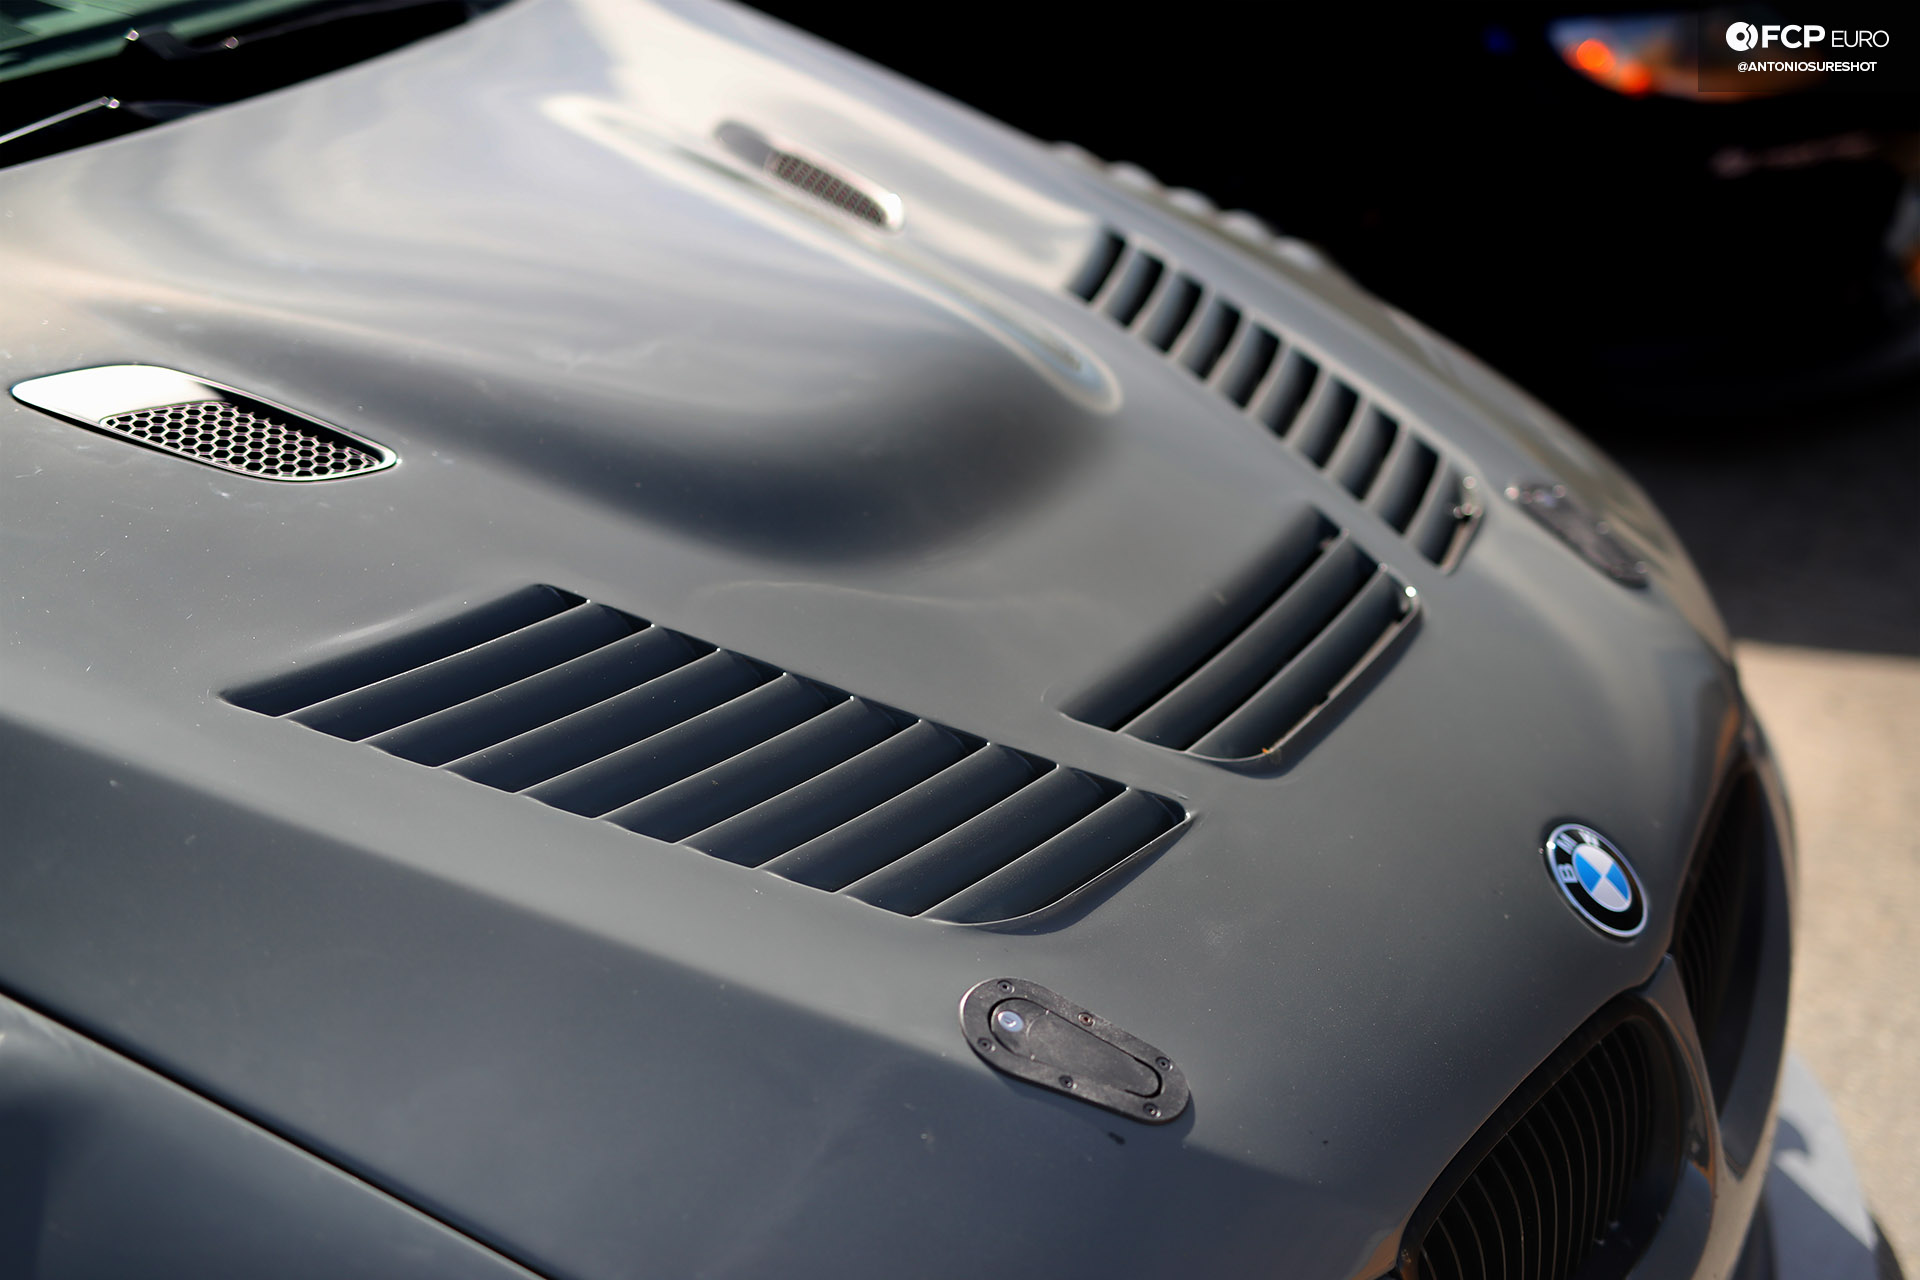 Bimmer Challenge BMW E92 M3 Motorsport 24 Vented Louvered Hood FCP Euro